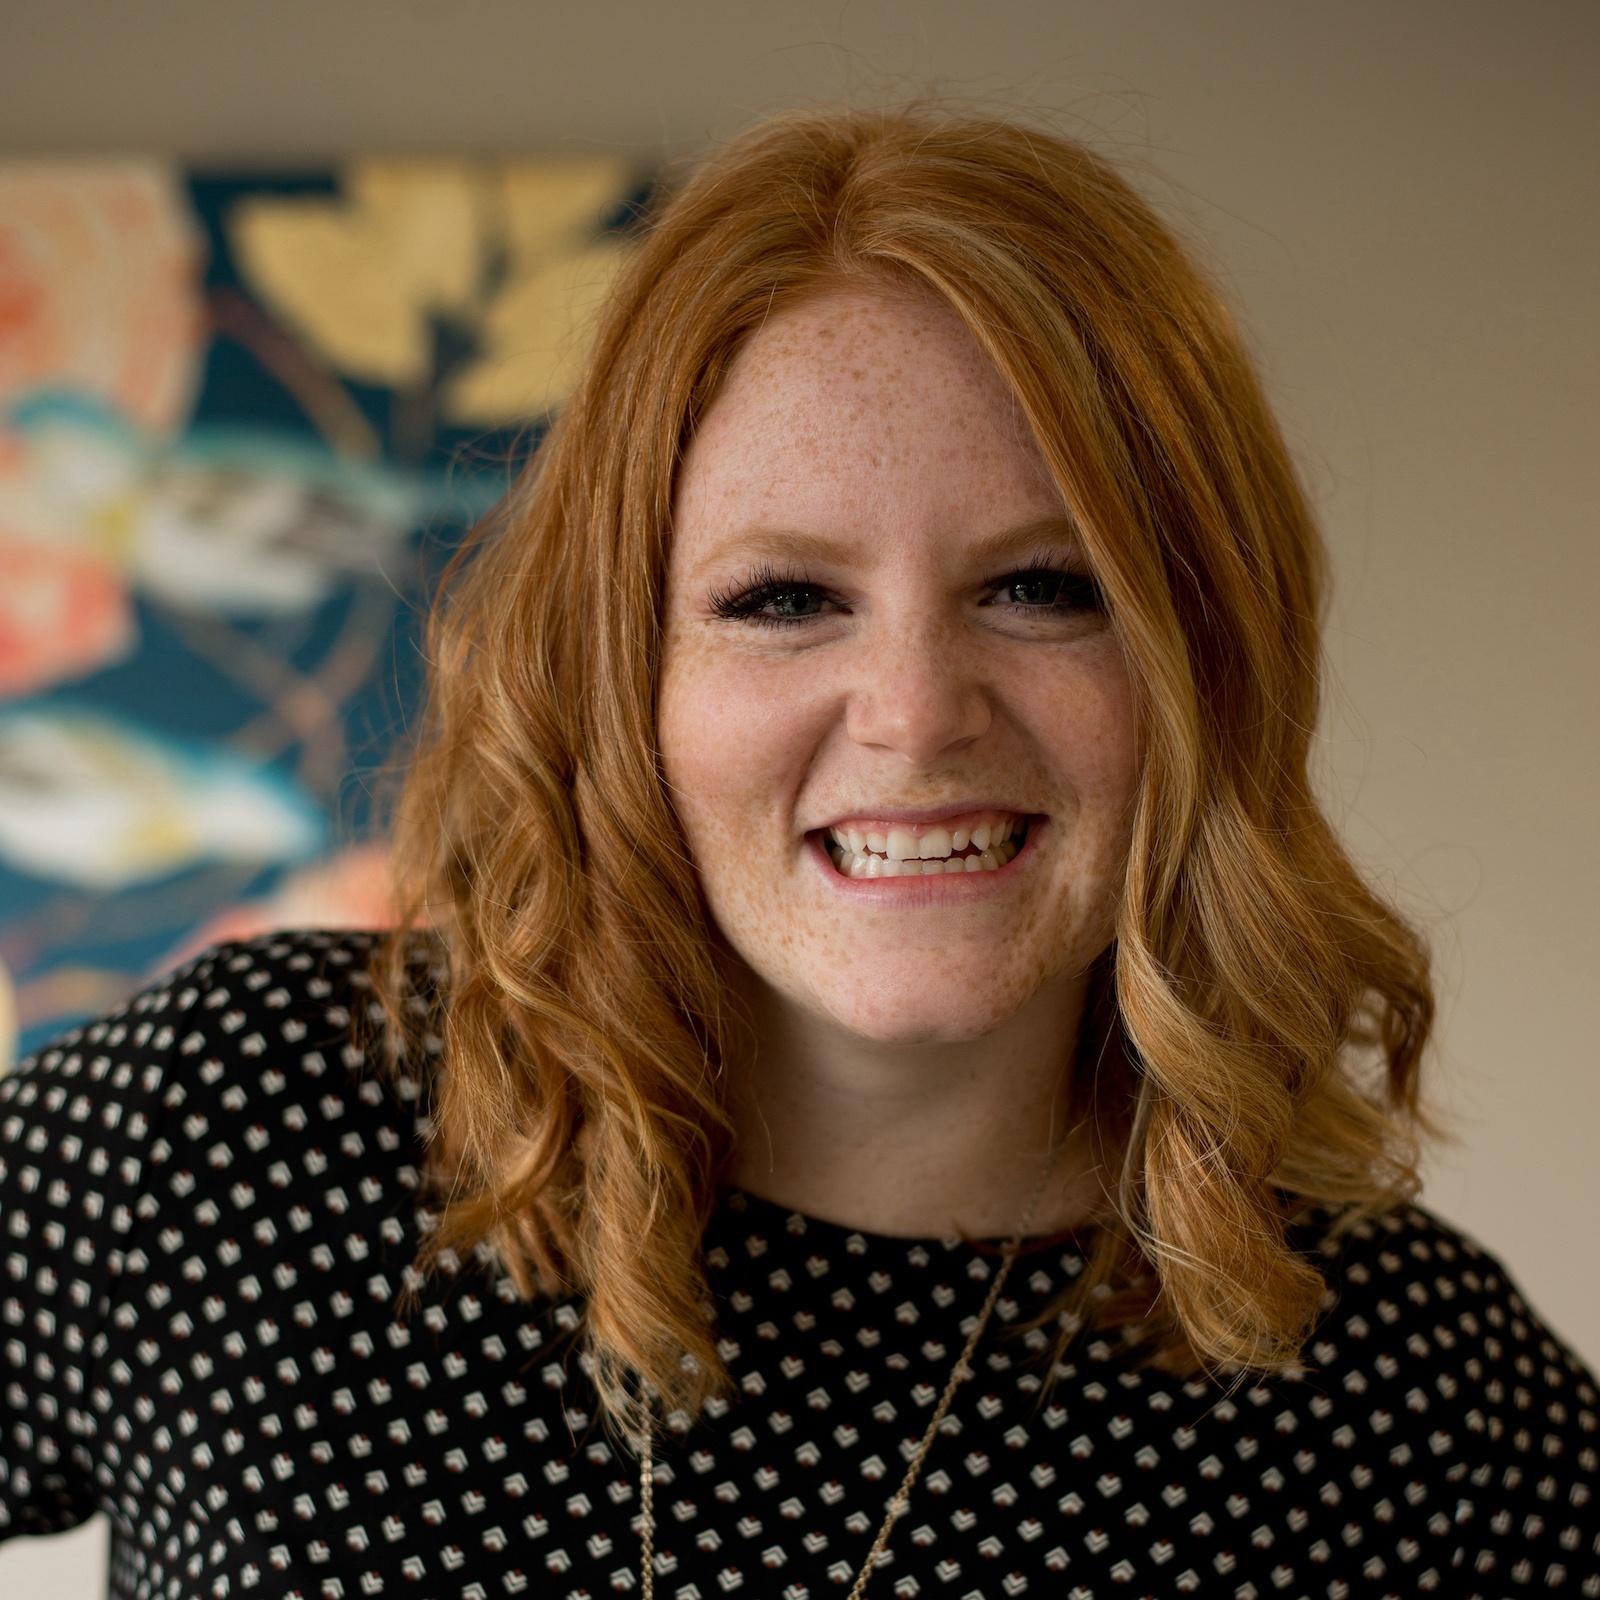 Alyssa Brohman Technical Chiropractic Assistant Elmira Family Chiropractic Square Version